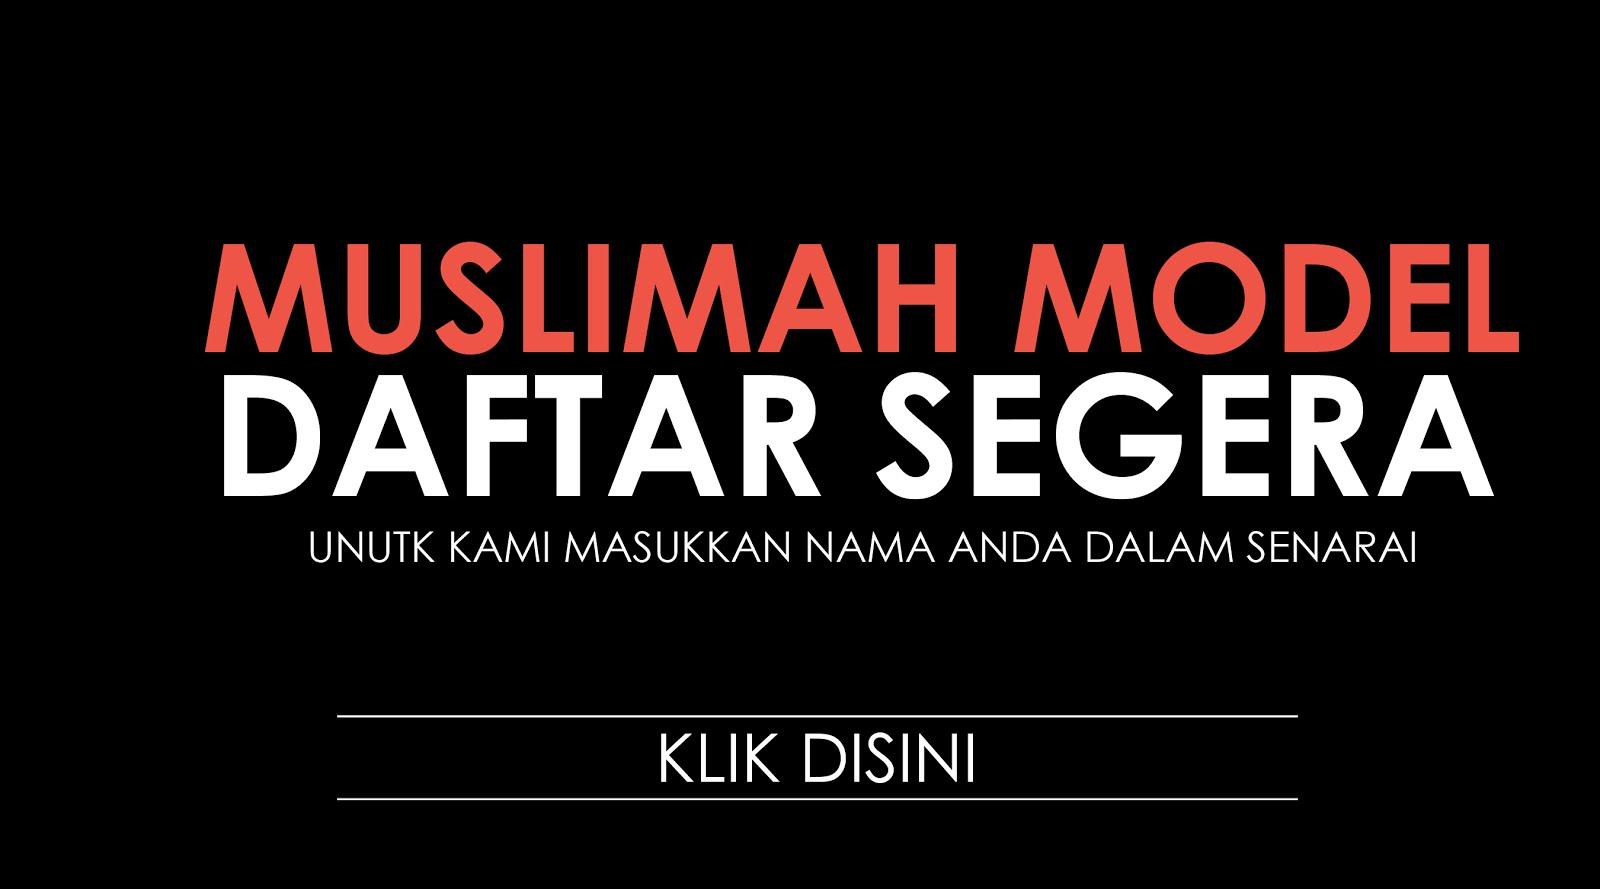 DAFTAR SEGERA UNTUK MENJADI MODEL MUSLIMAH